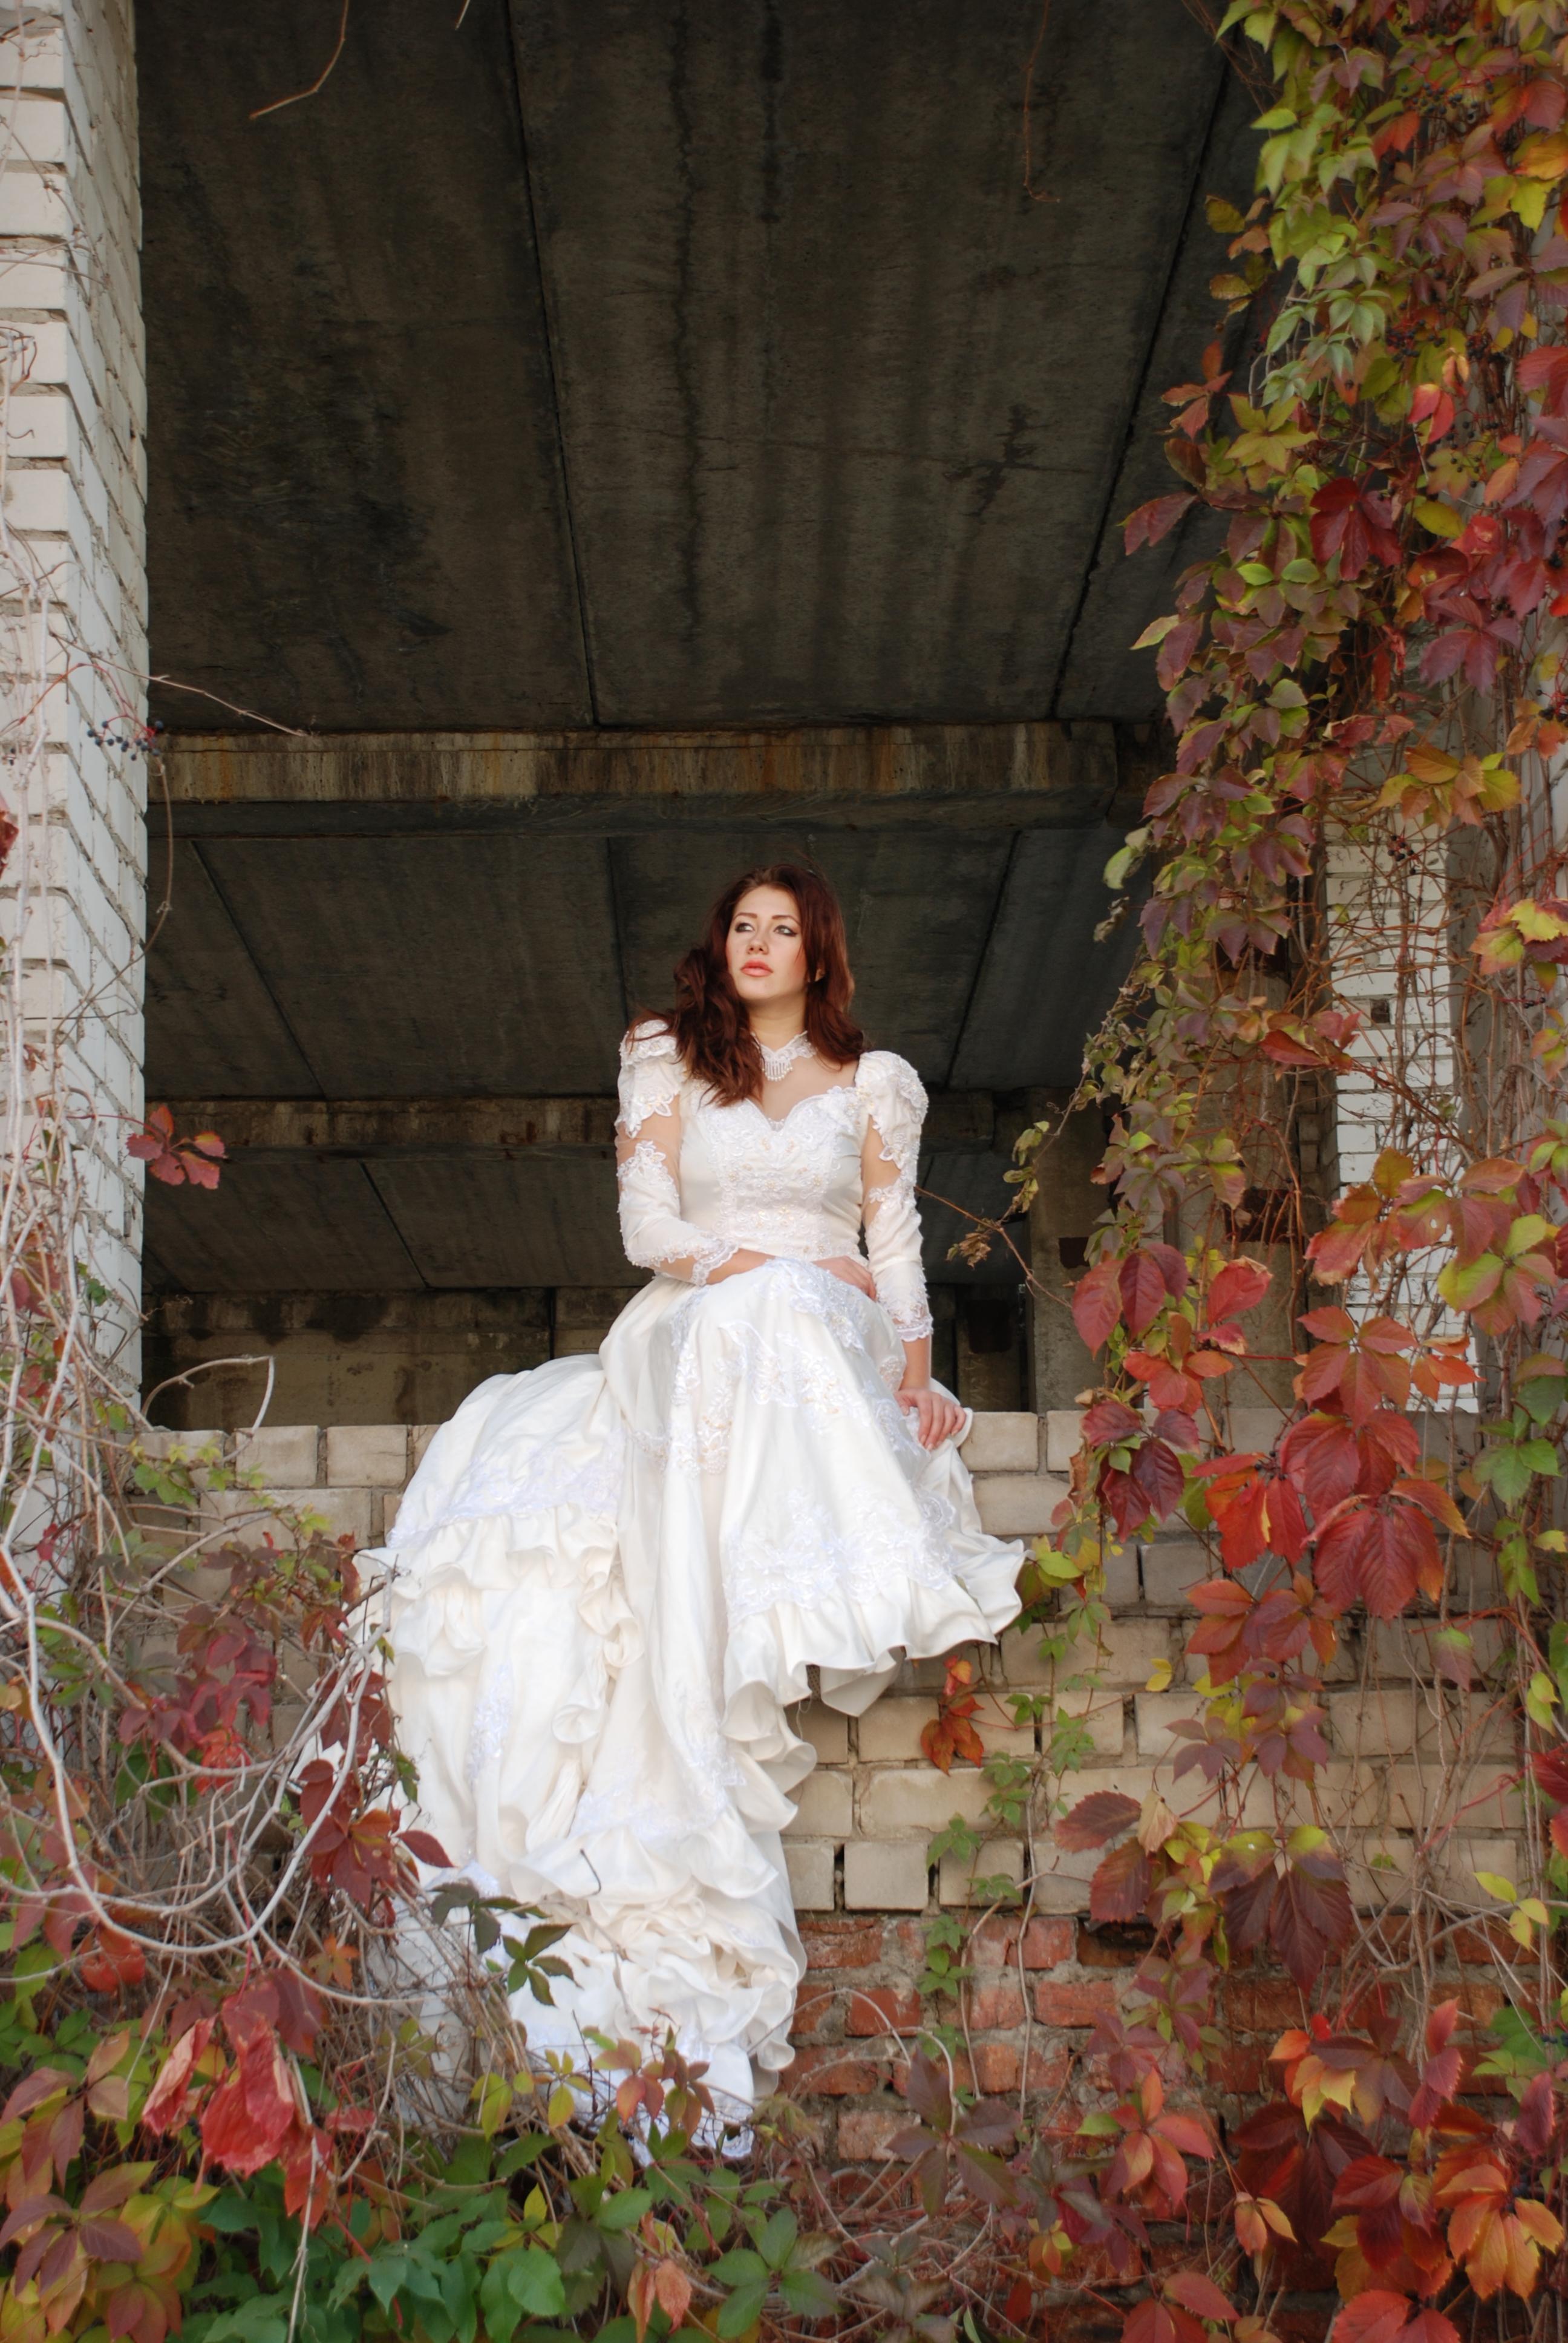 The sad bride_12 by anastasiya-landa